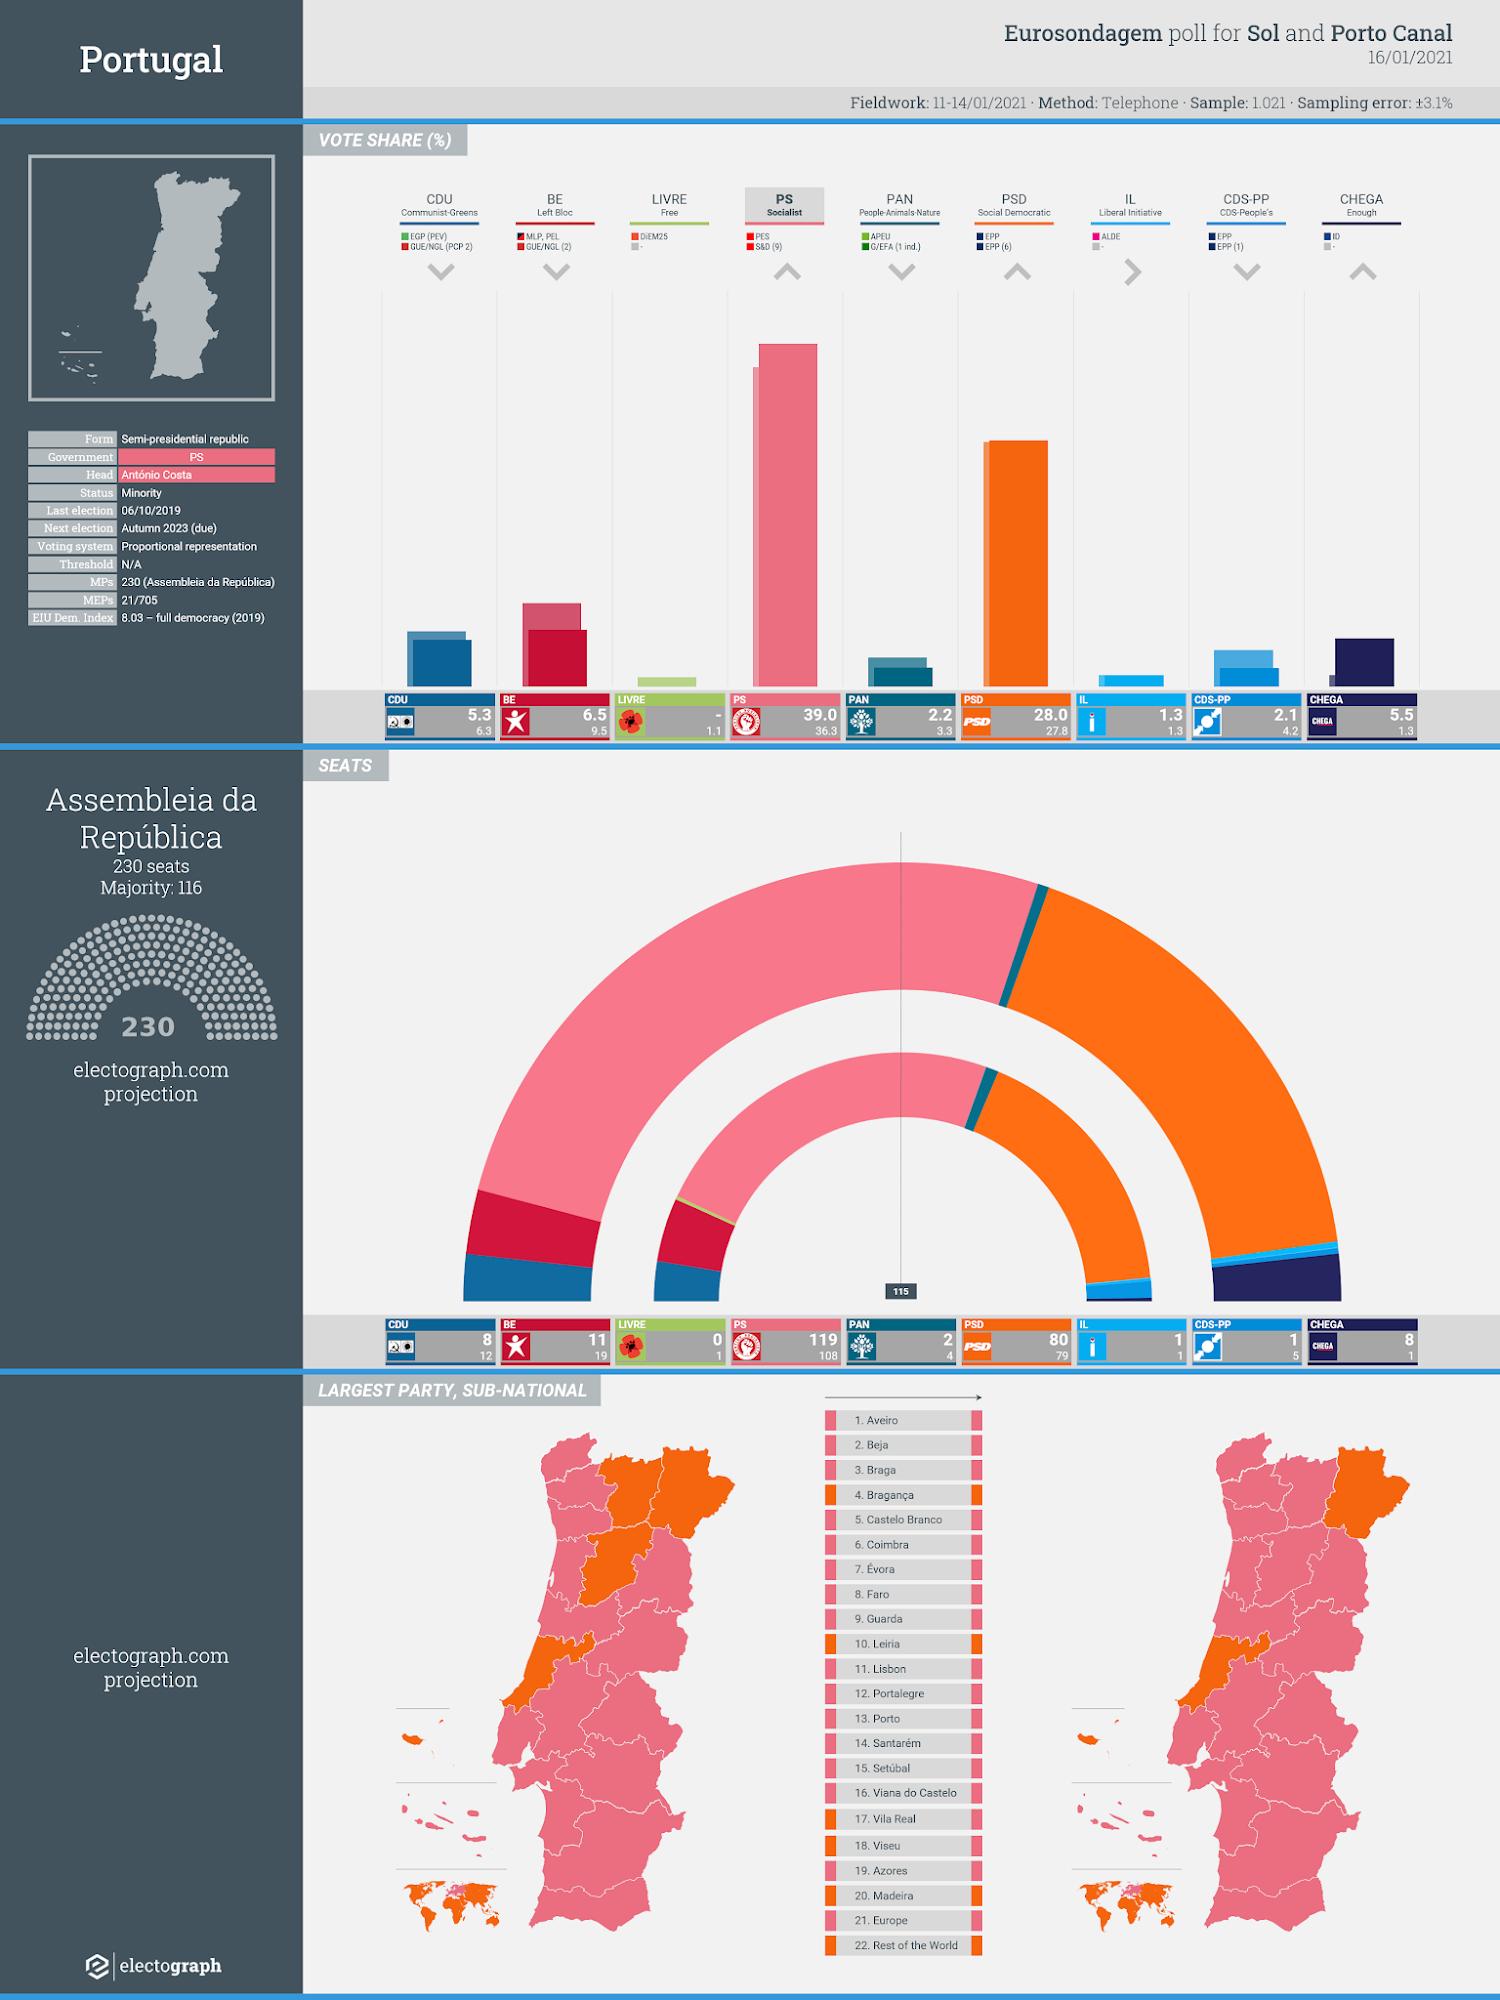 PORTUGAL: Eurosondagem poll chart for Sol and Porto Canal, 16 January 2021